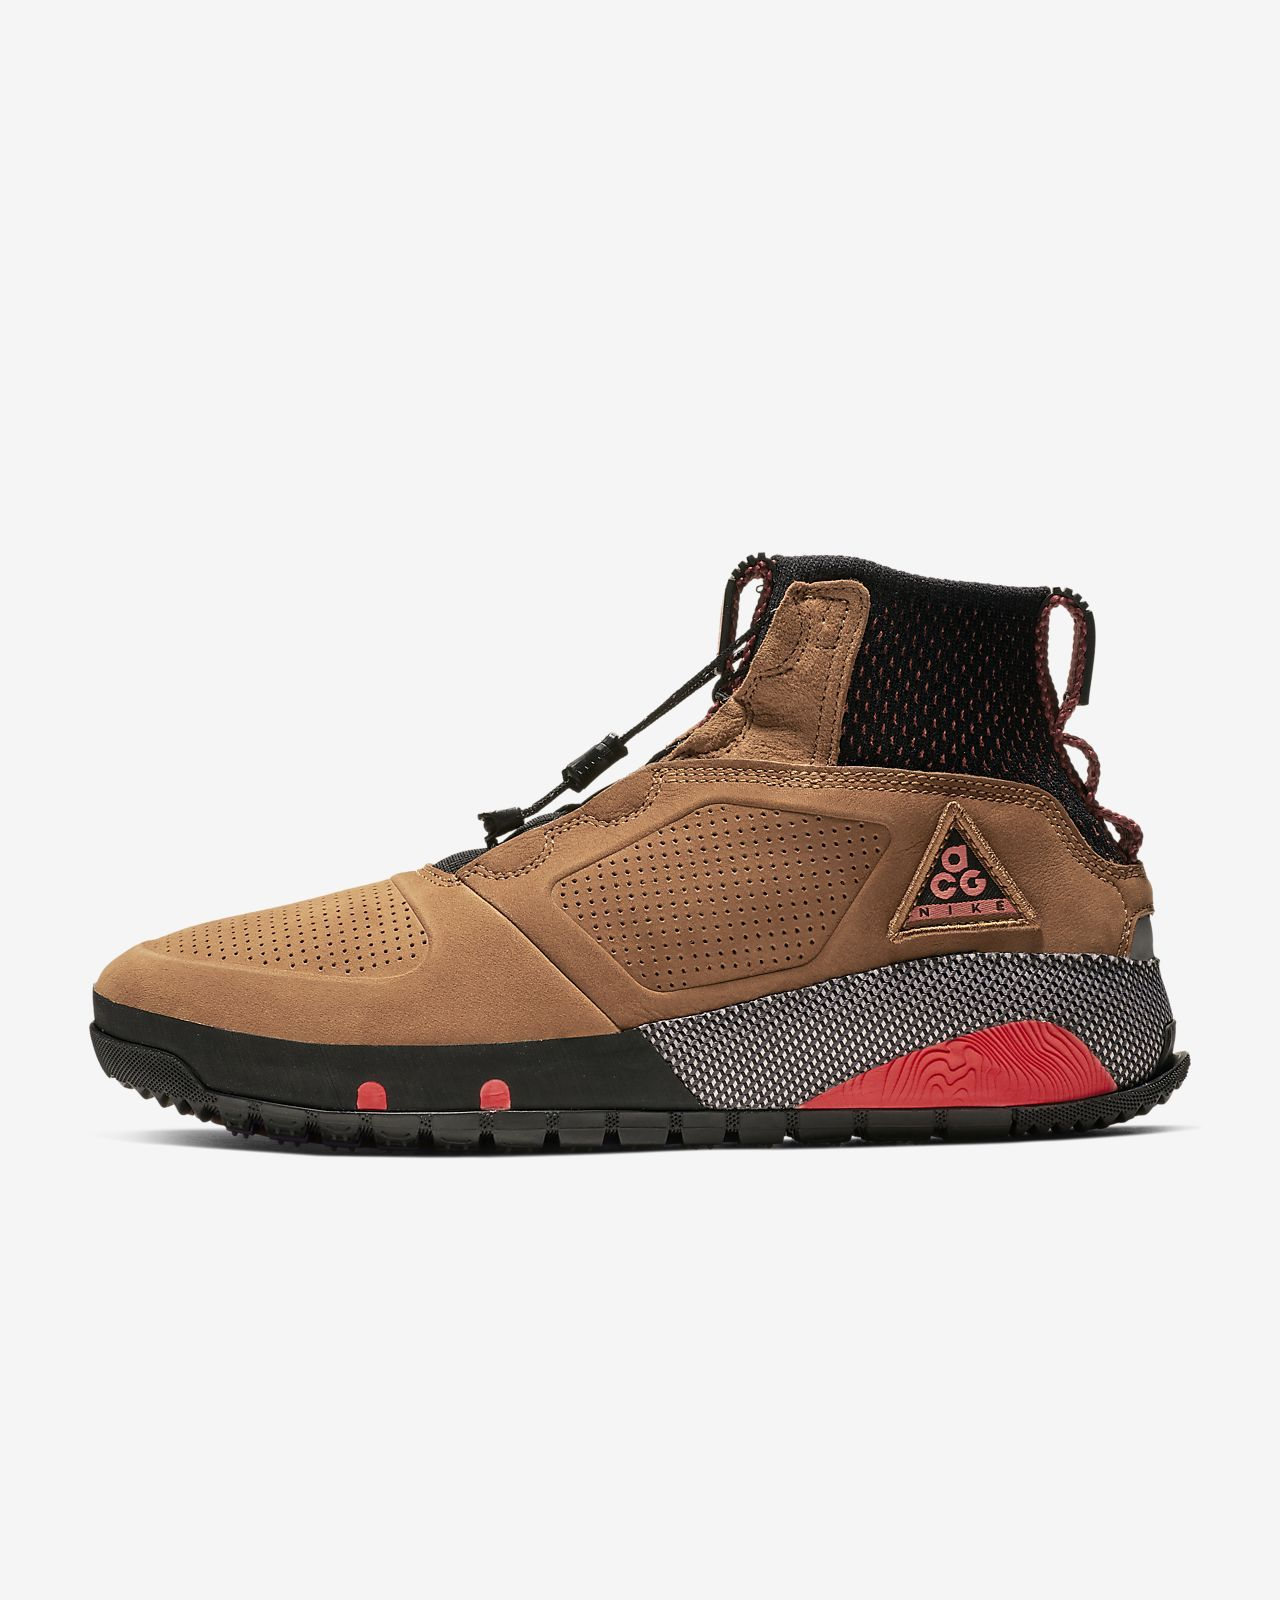 new style 39c44 19aff Nike ACG Ruckel Ridge Men s Shoe